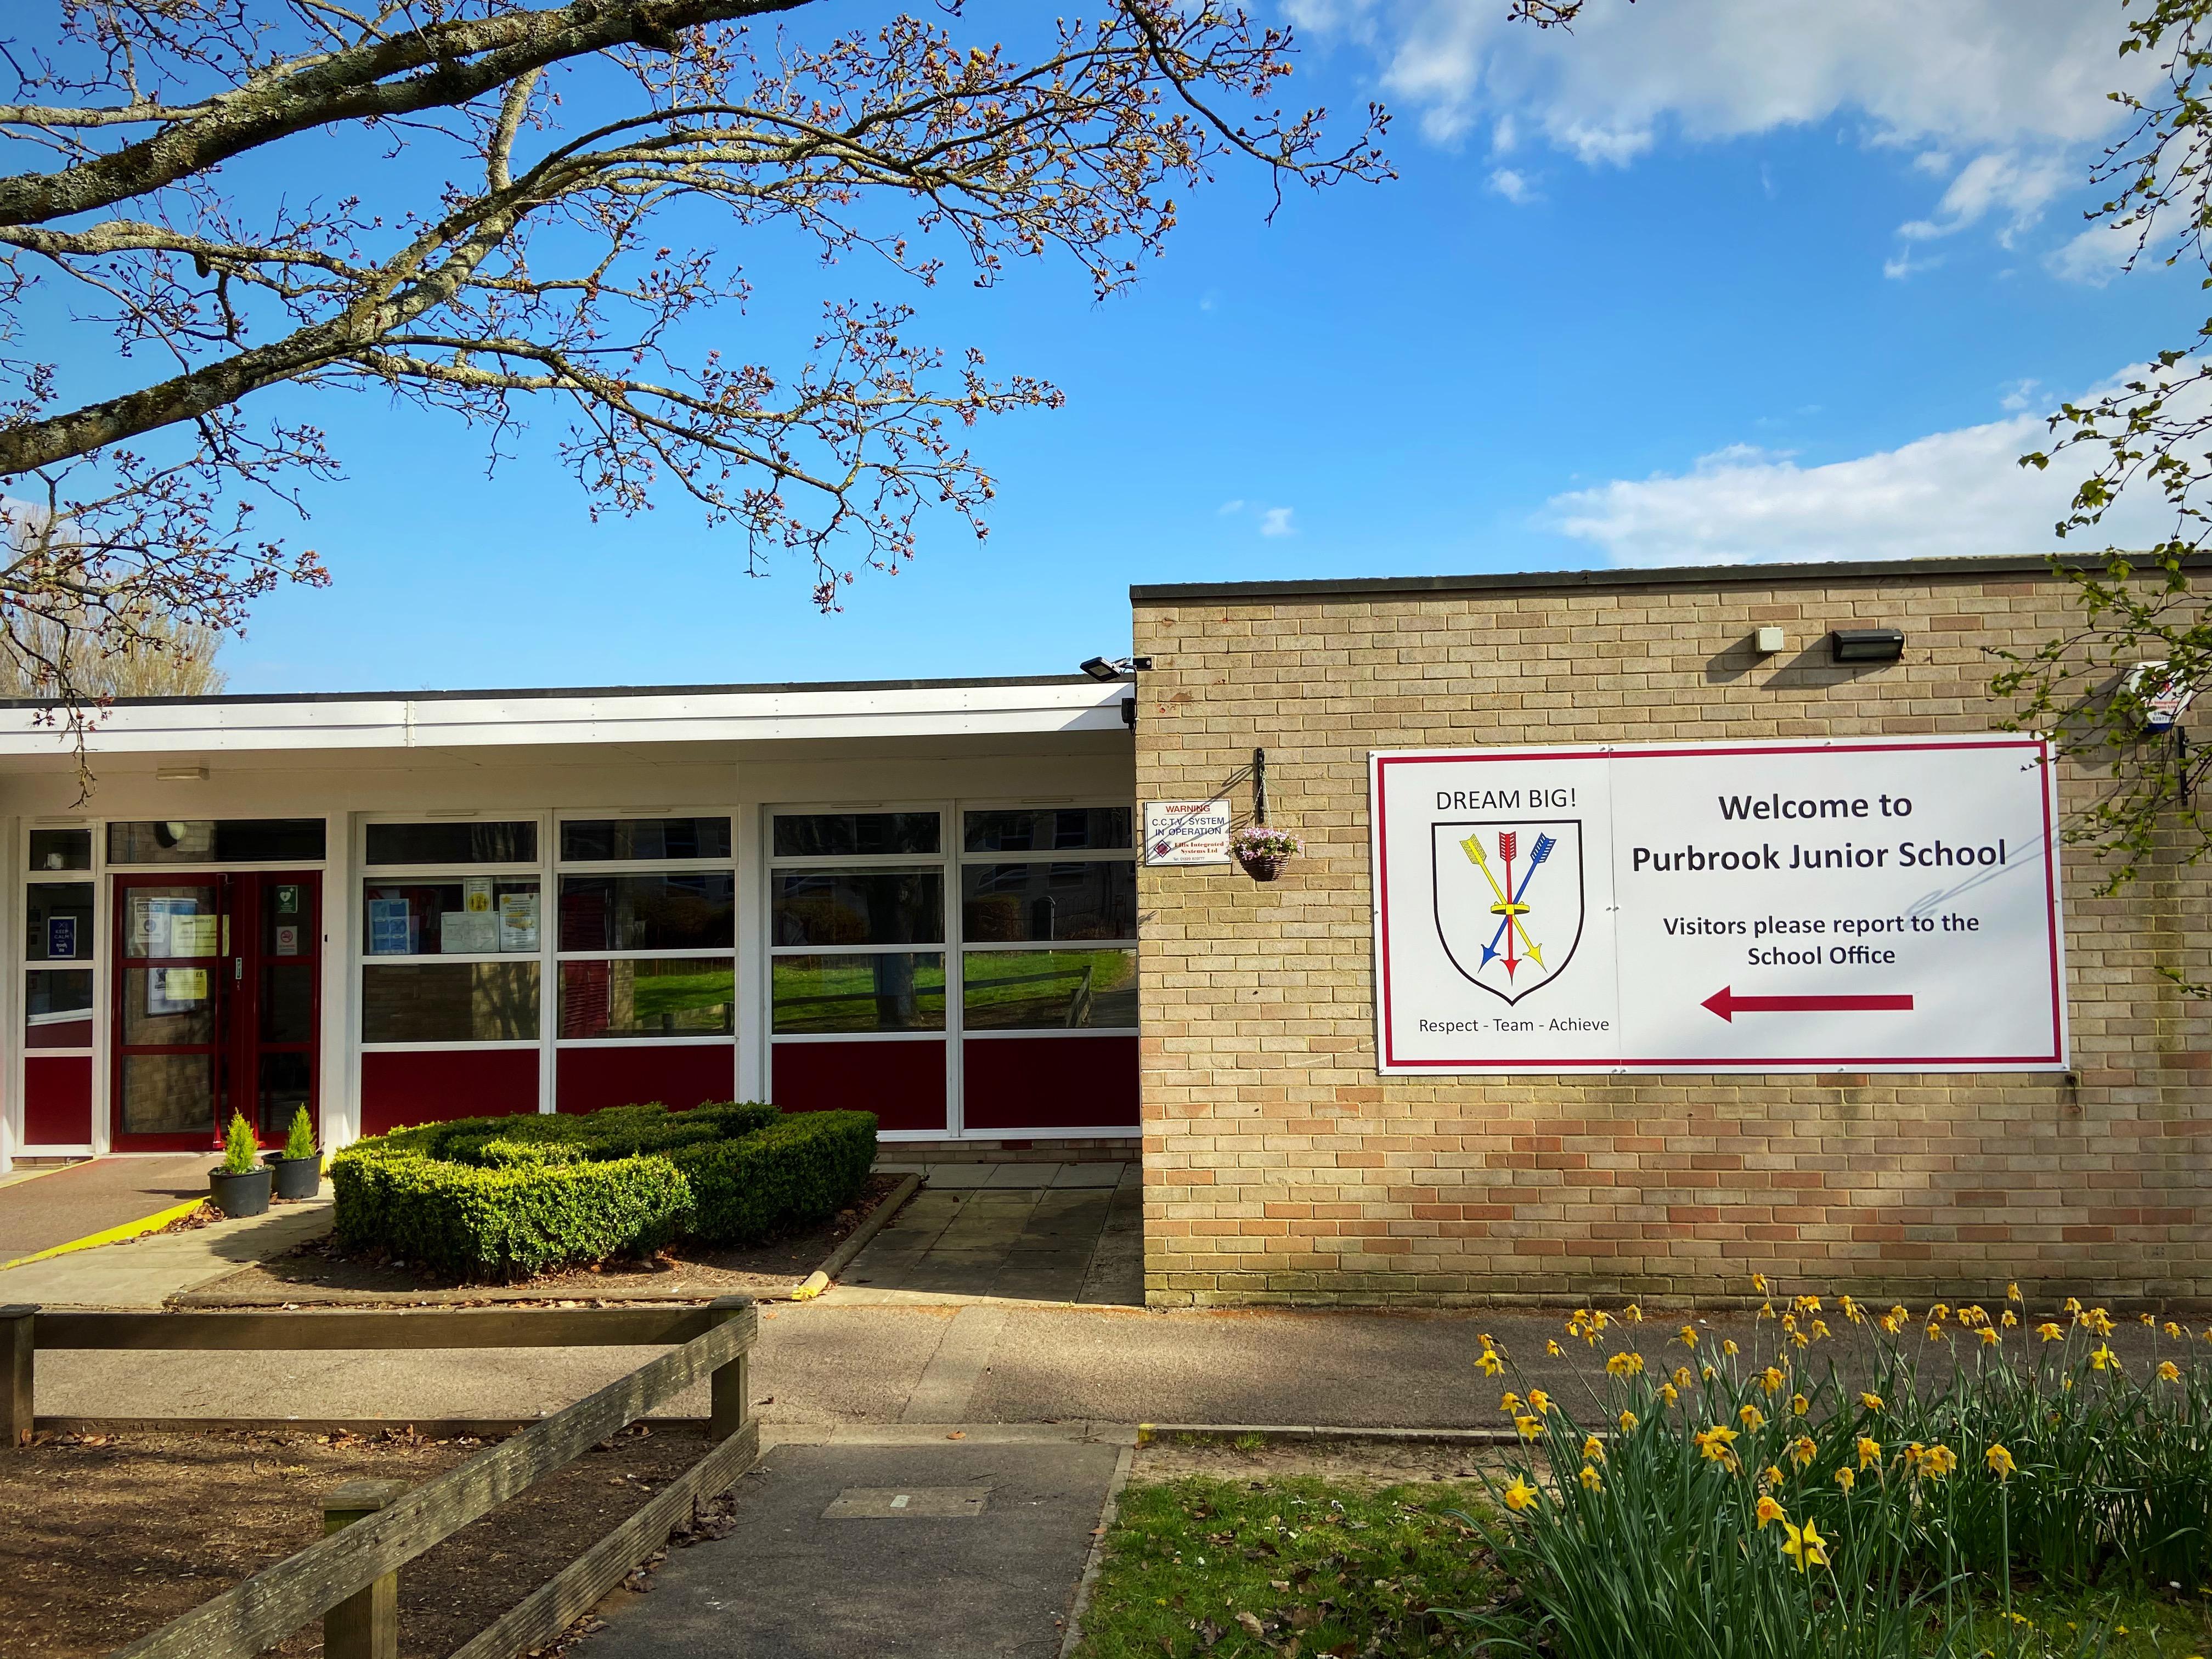 School Entrance and Reception